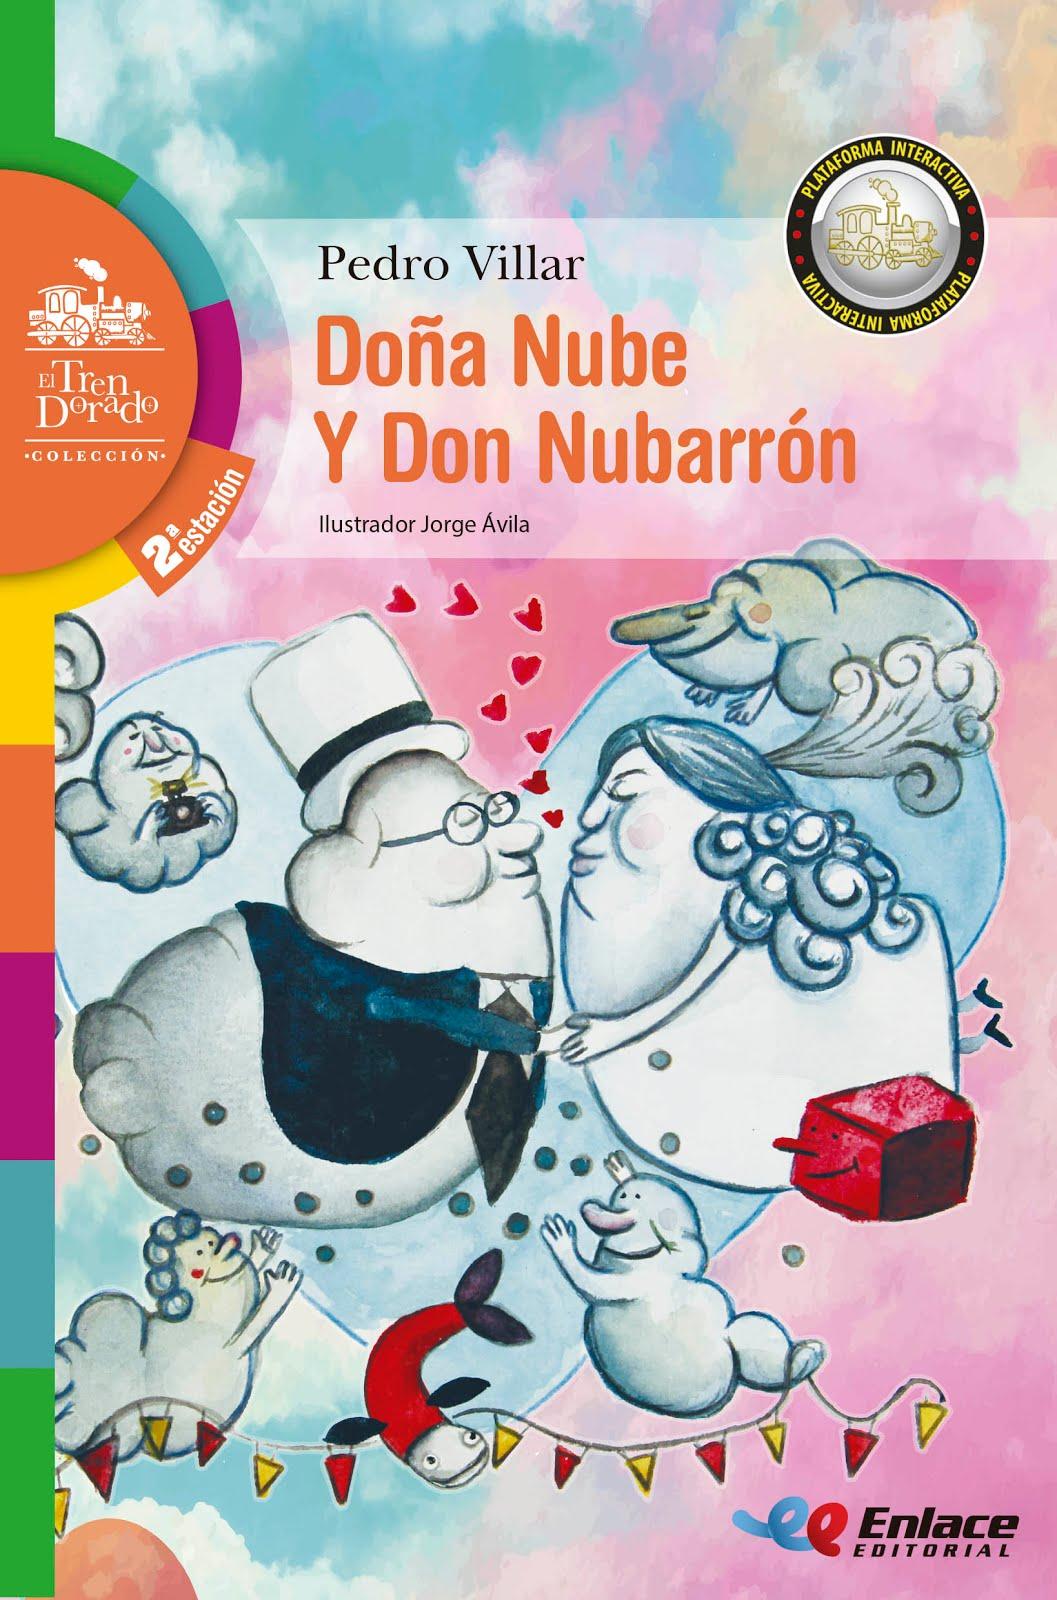 DOÑA NUBE Y DON NUBARRÓN